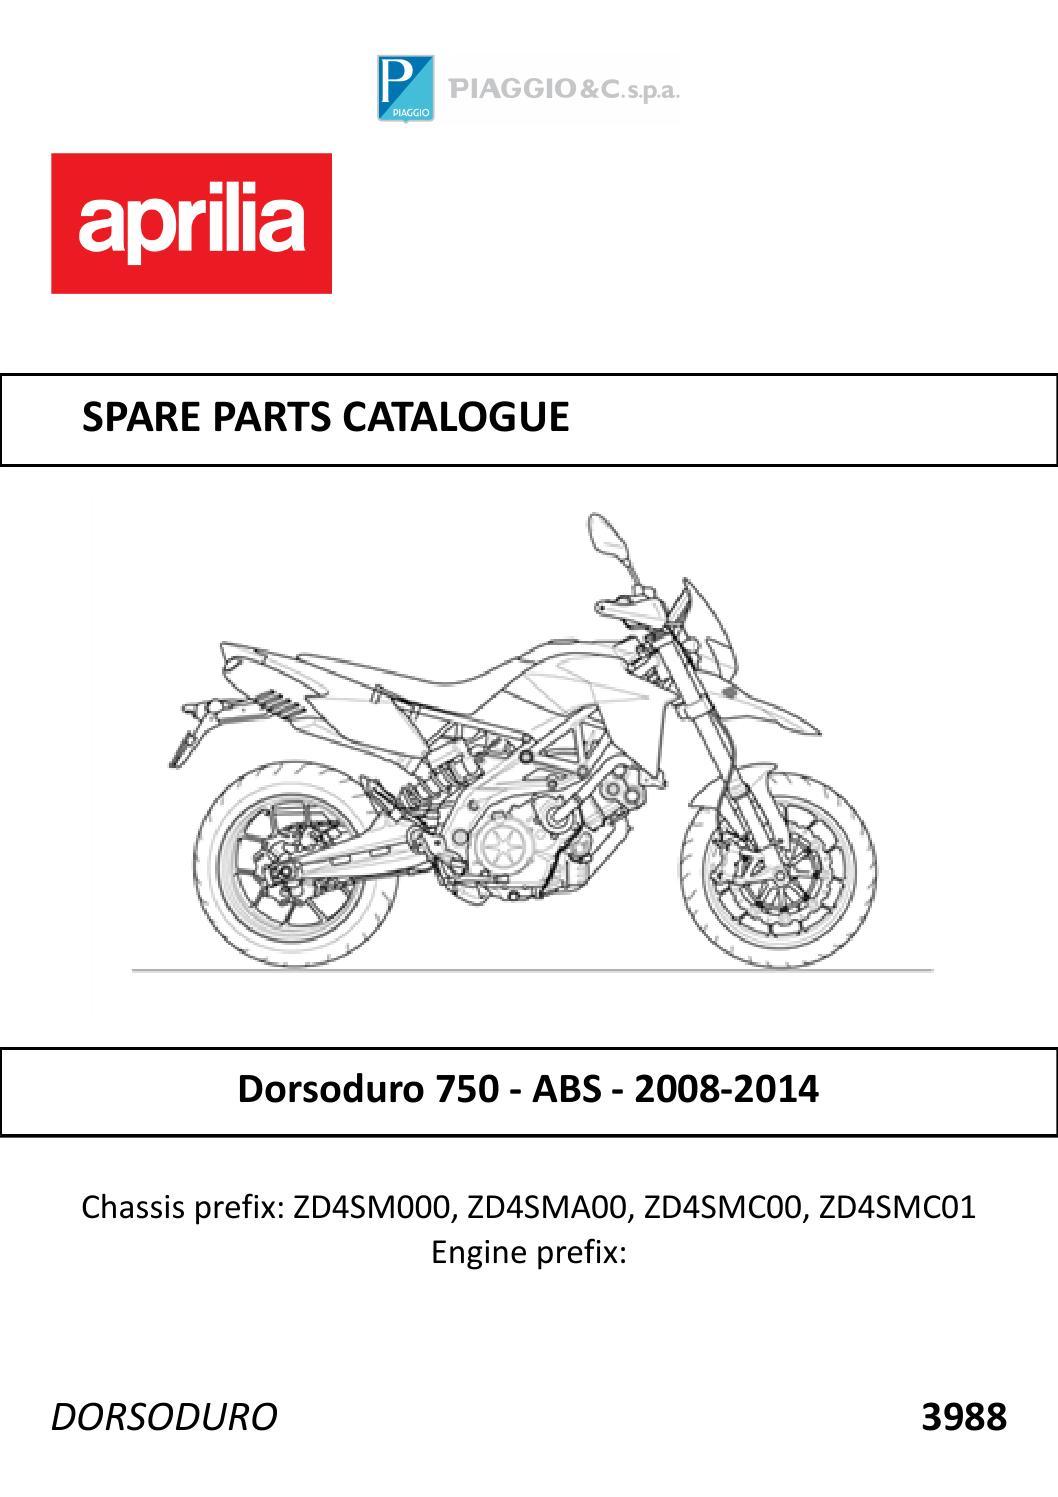 wrg 1641] aprilia dorsoduro 750 wiring diagram aprilia shiver 900 review aprilia shiver 750 wiring diagram #11